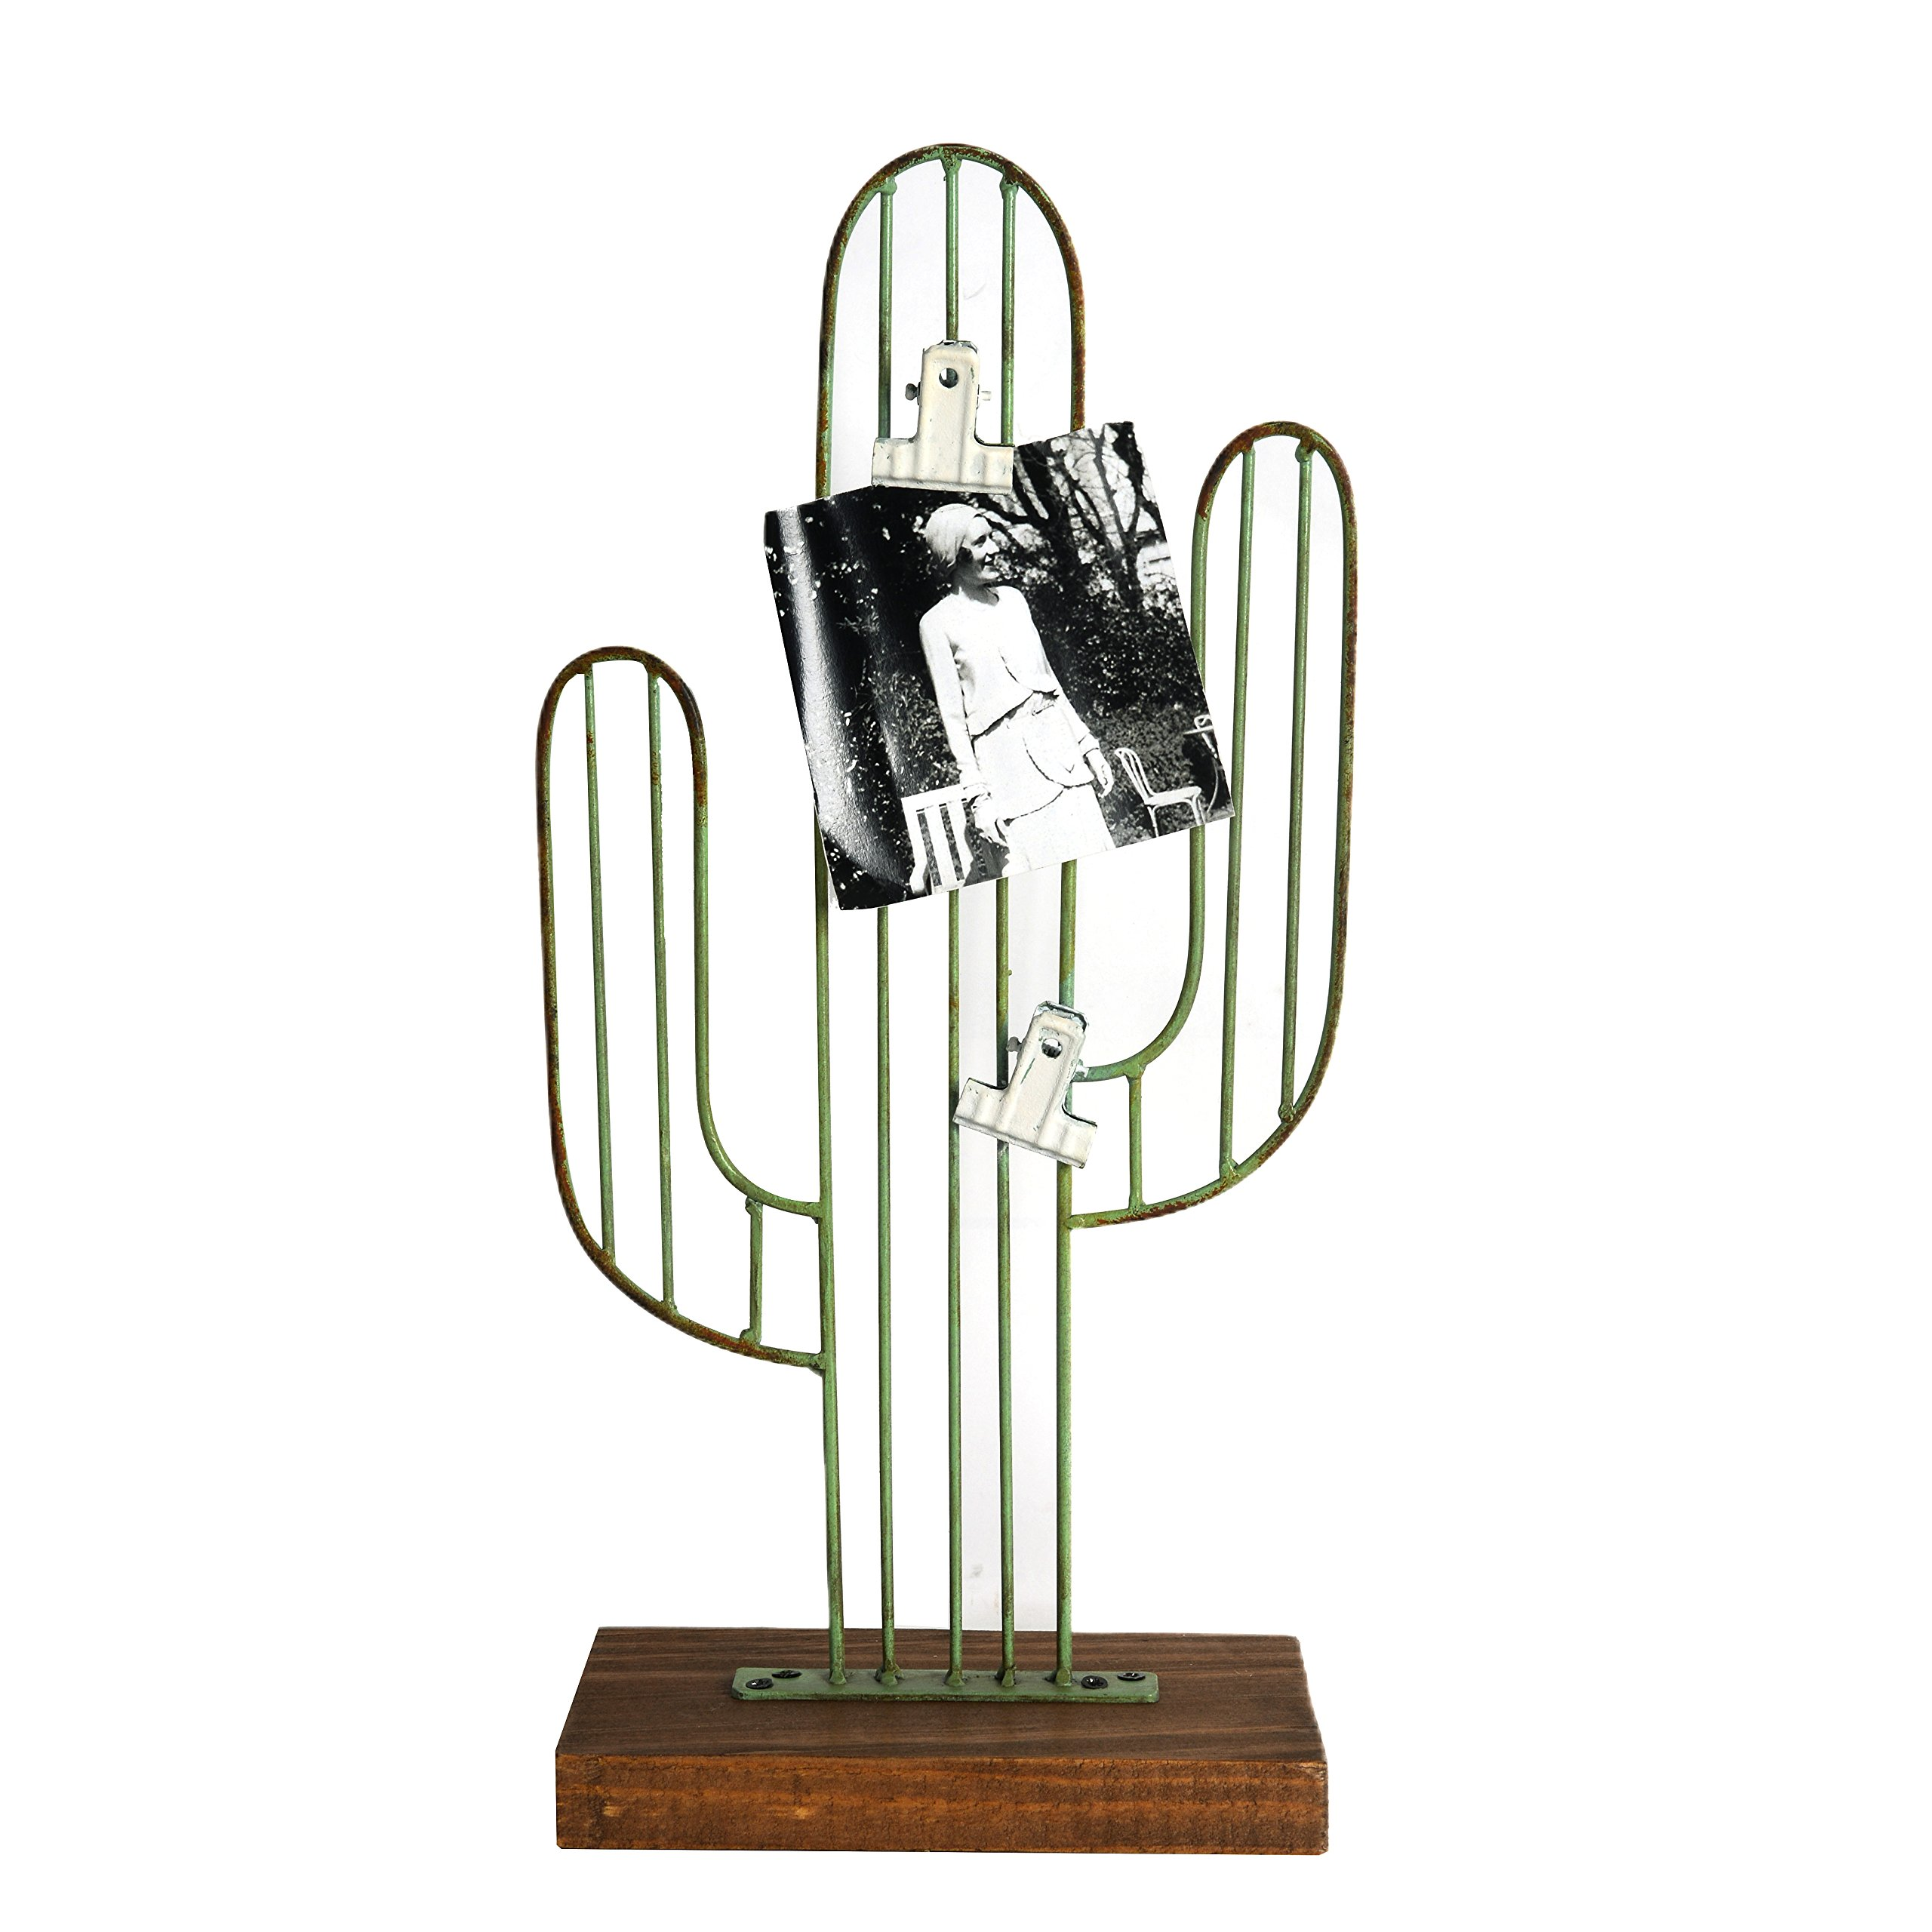 Nikky Home Metal Cactus Memo Holder Desk Paper Clip Organizer Stand, Green